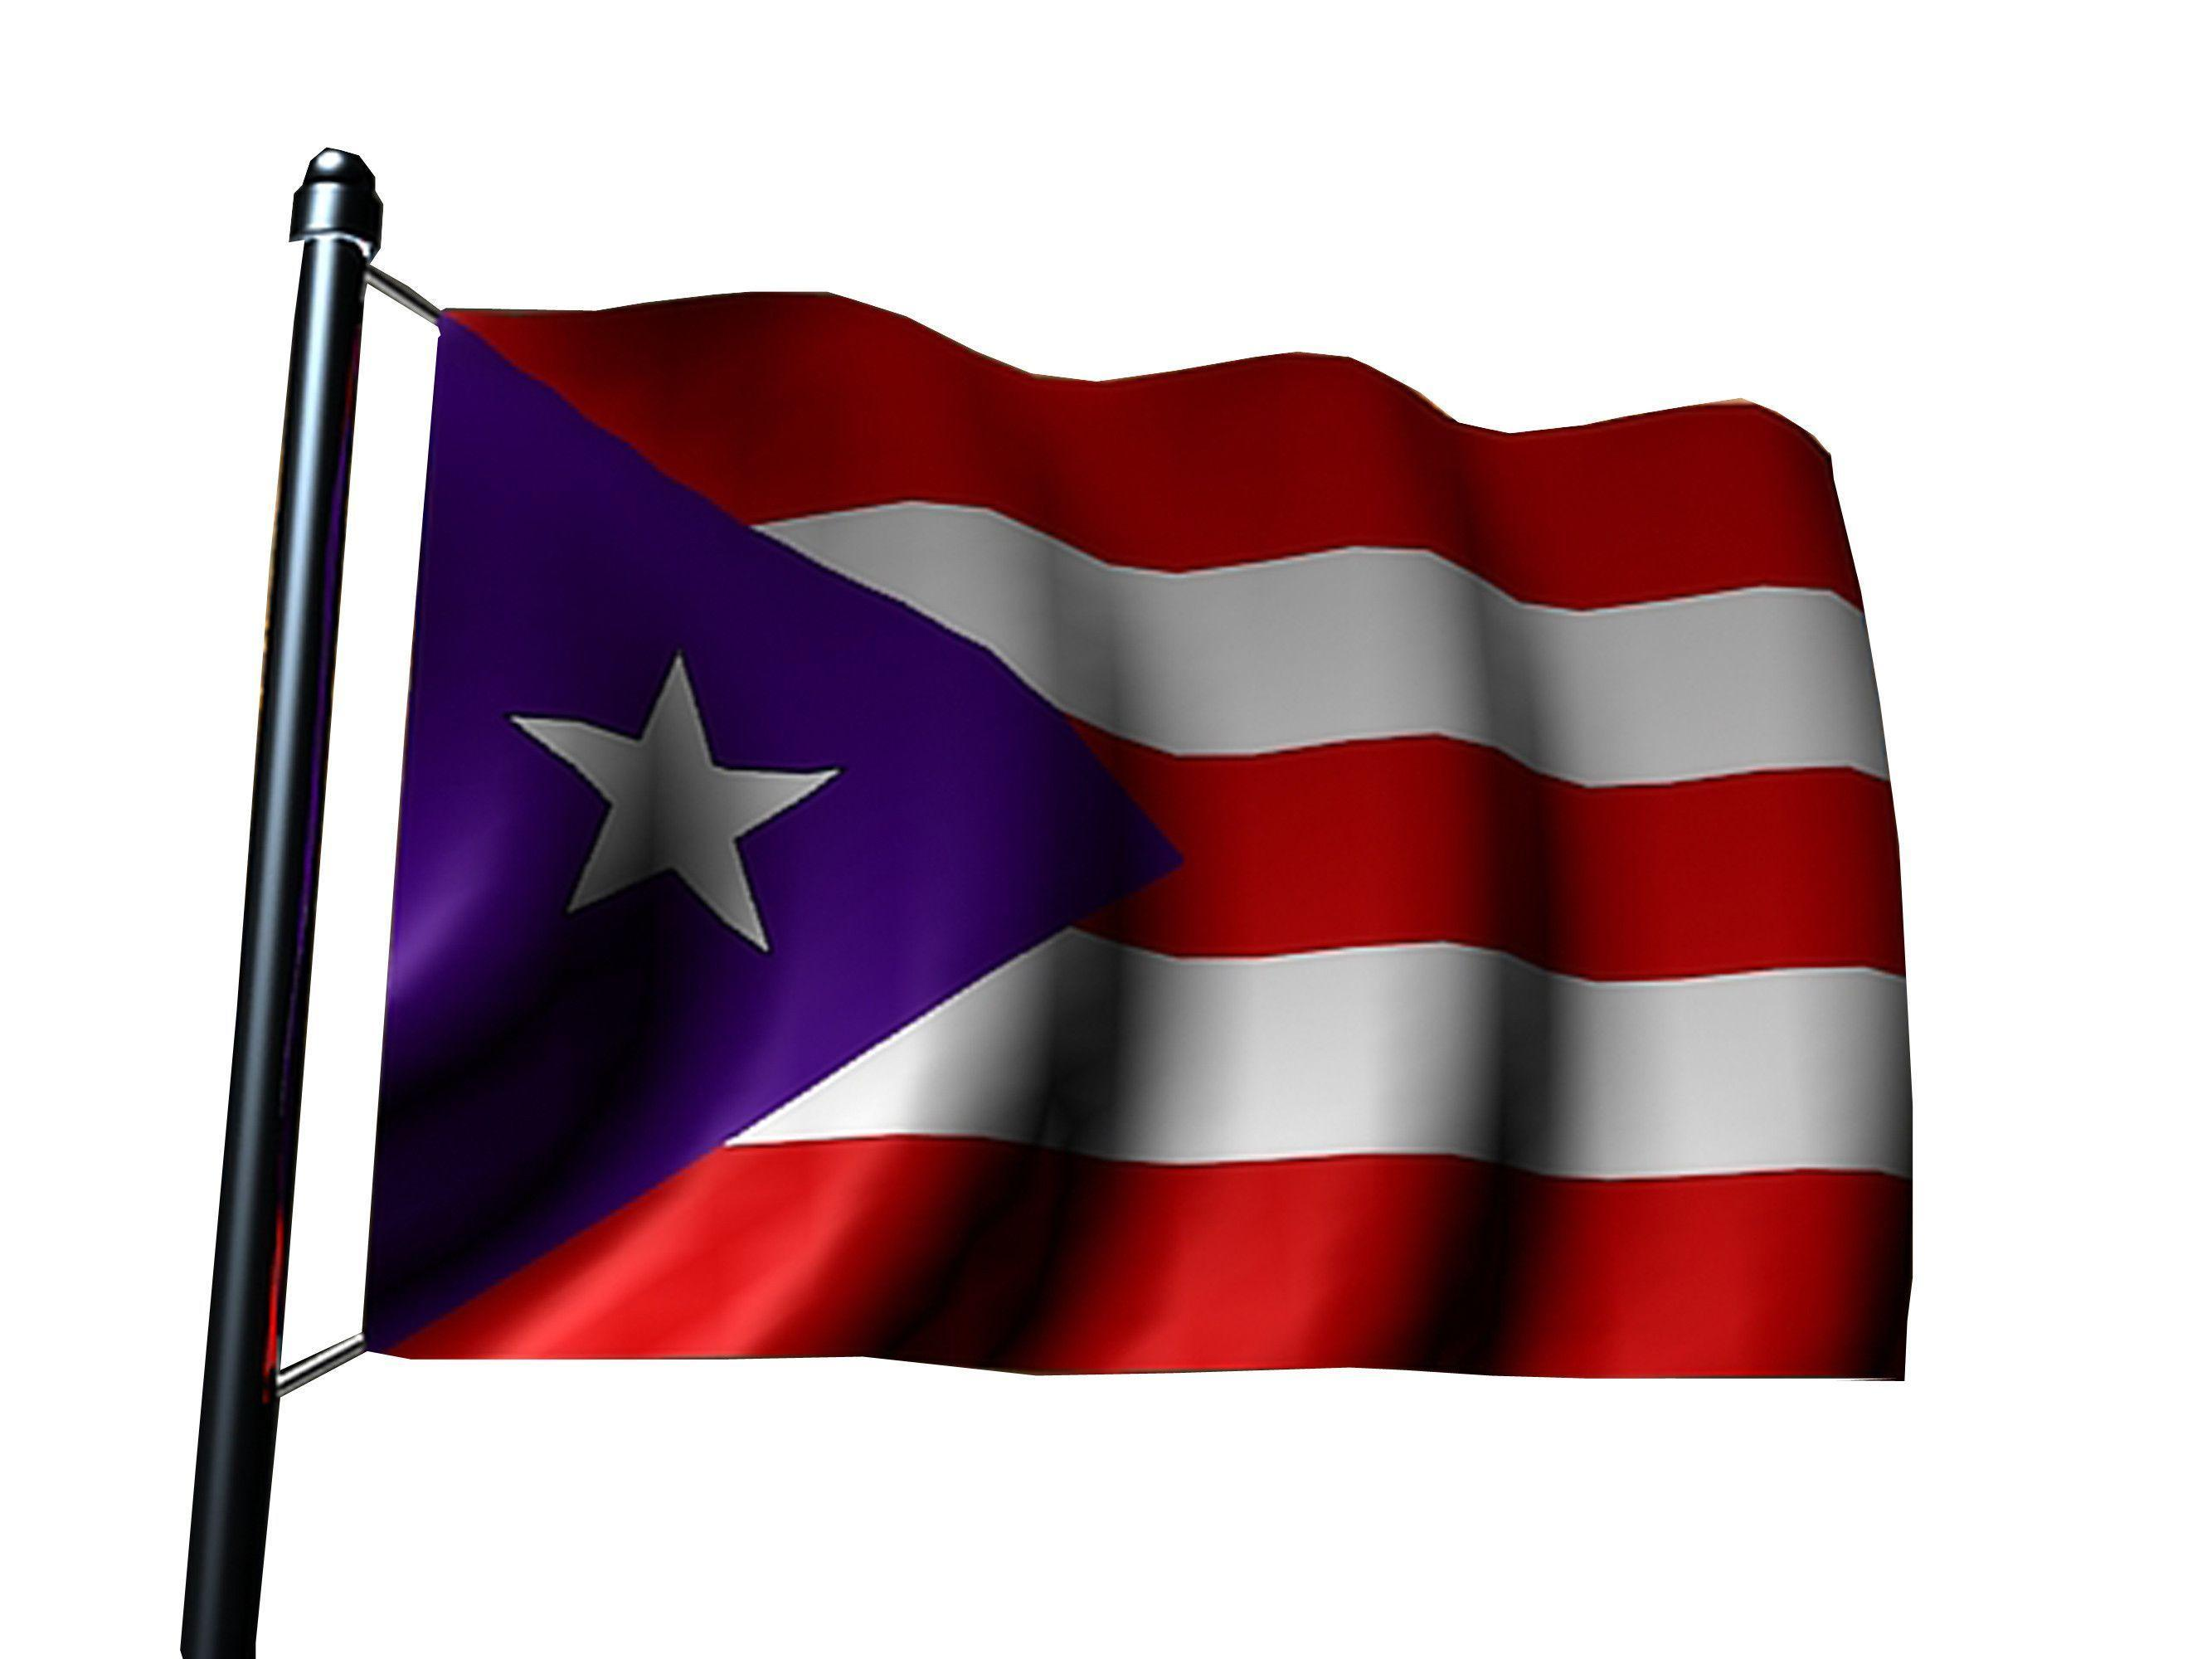 puerto rico flag wallpaper hd - photo #17